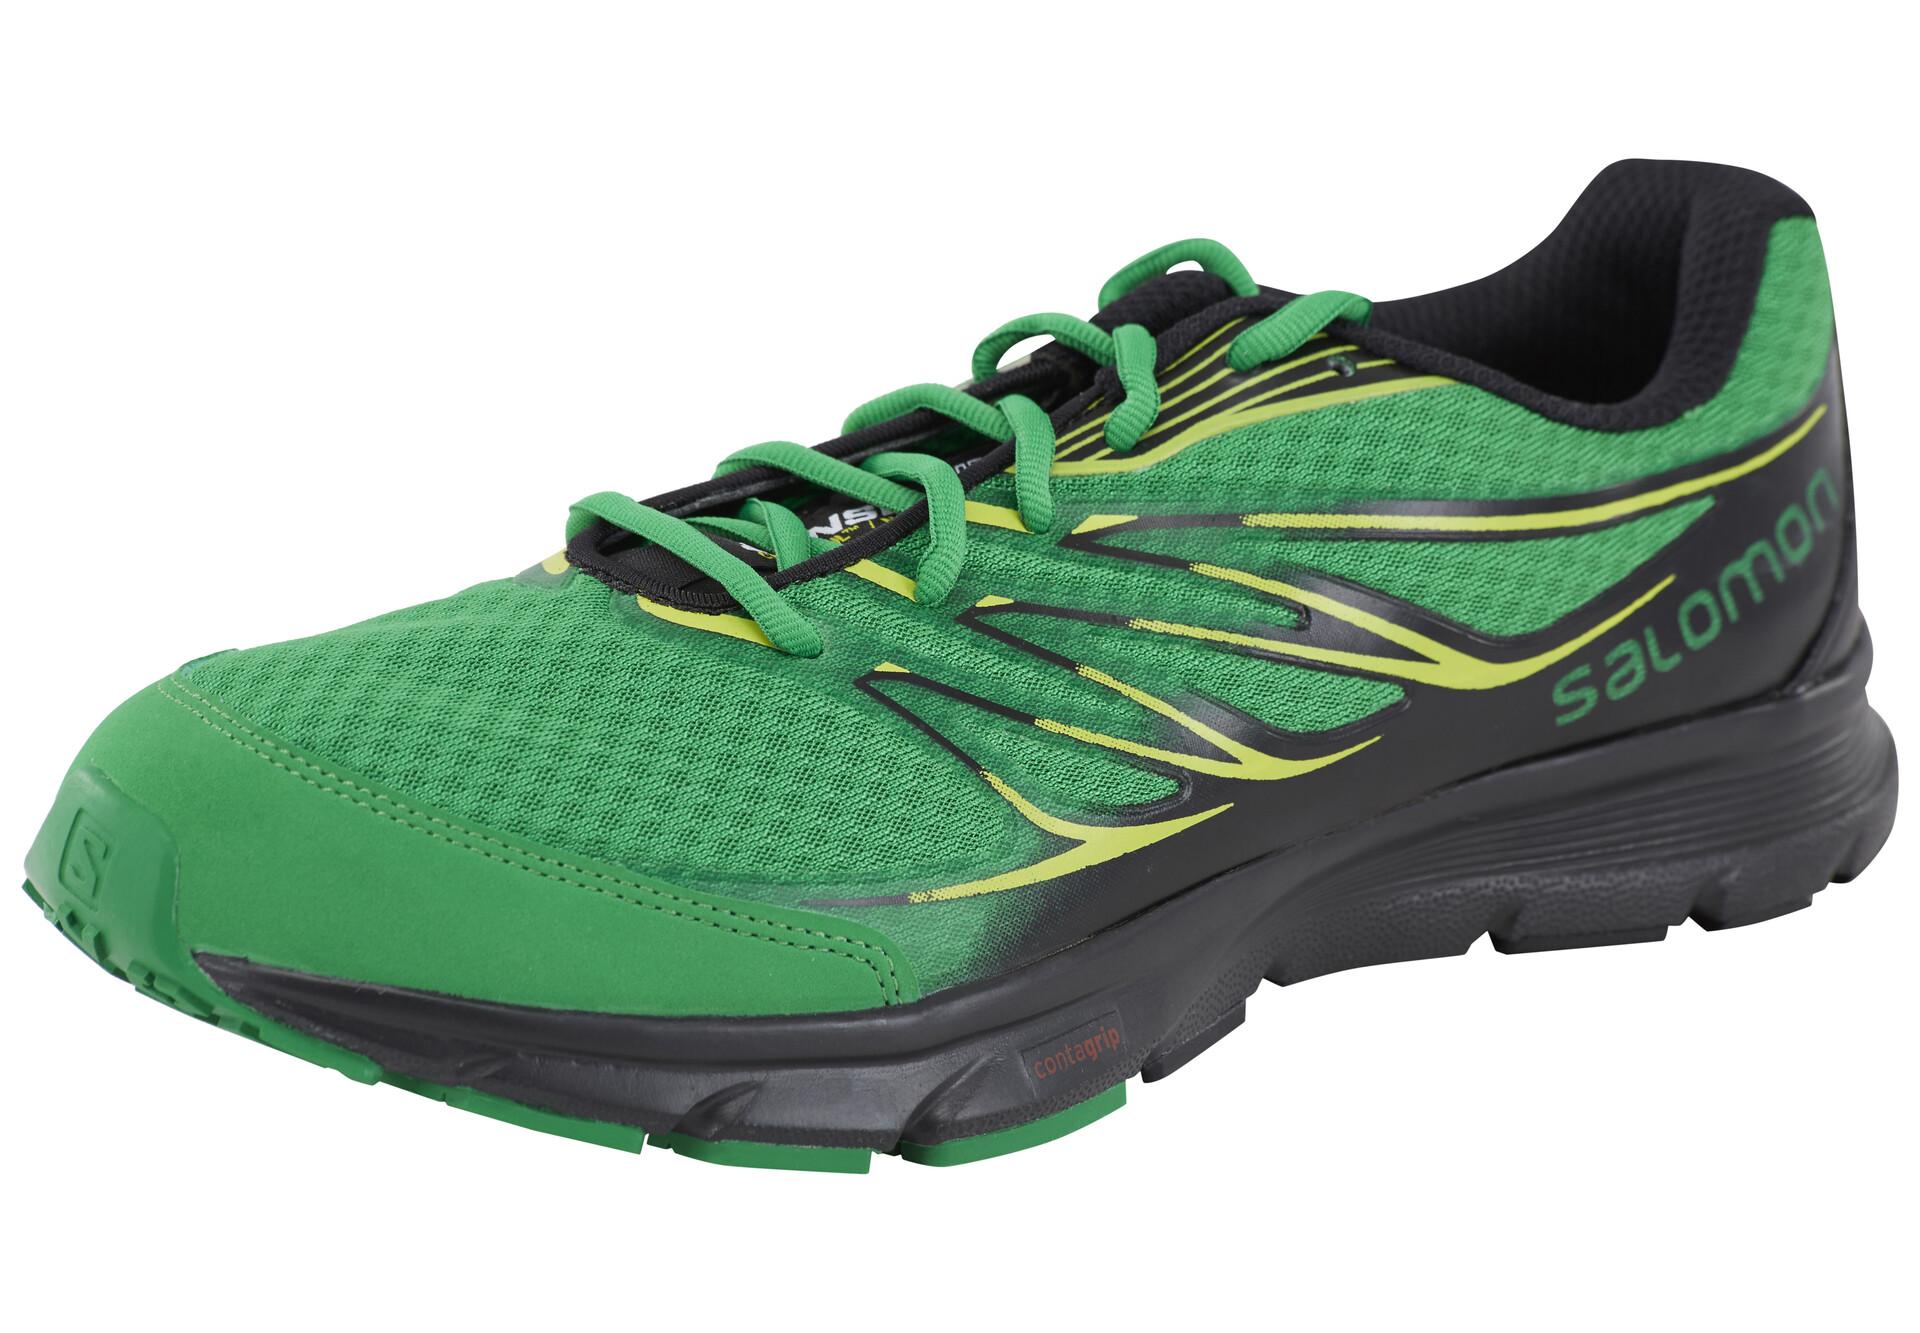 De Chaussures Link Salomon Vert Homme Running Sense Boutique BS5x0qO